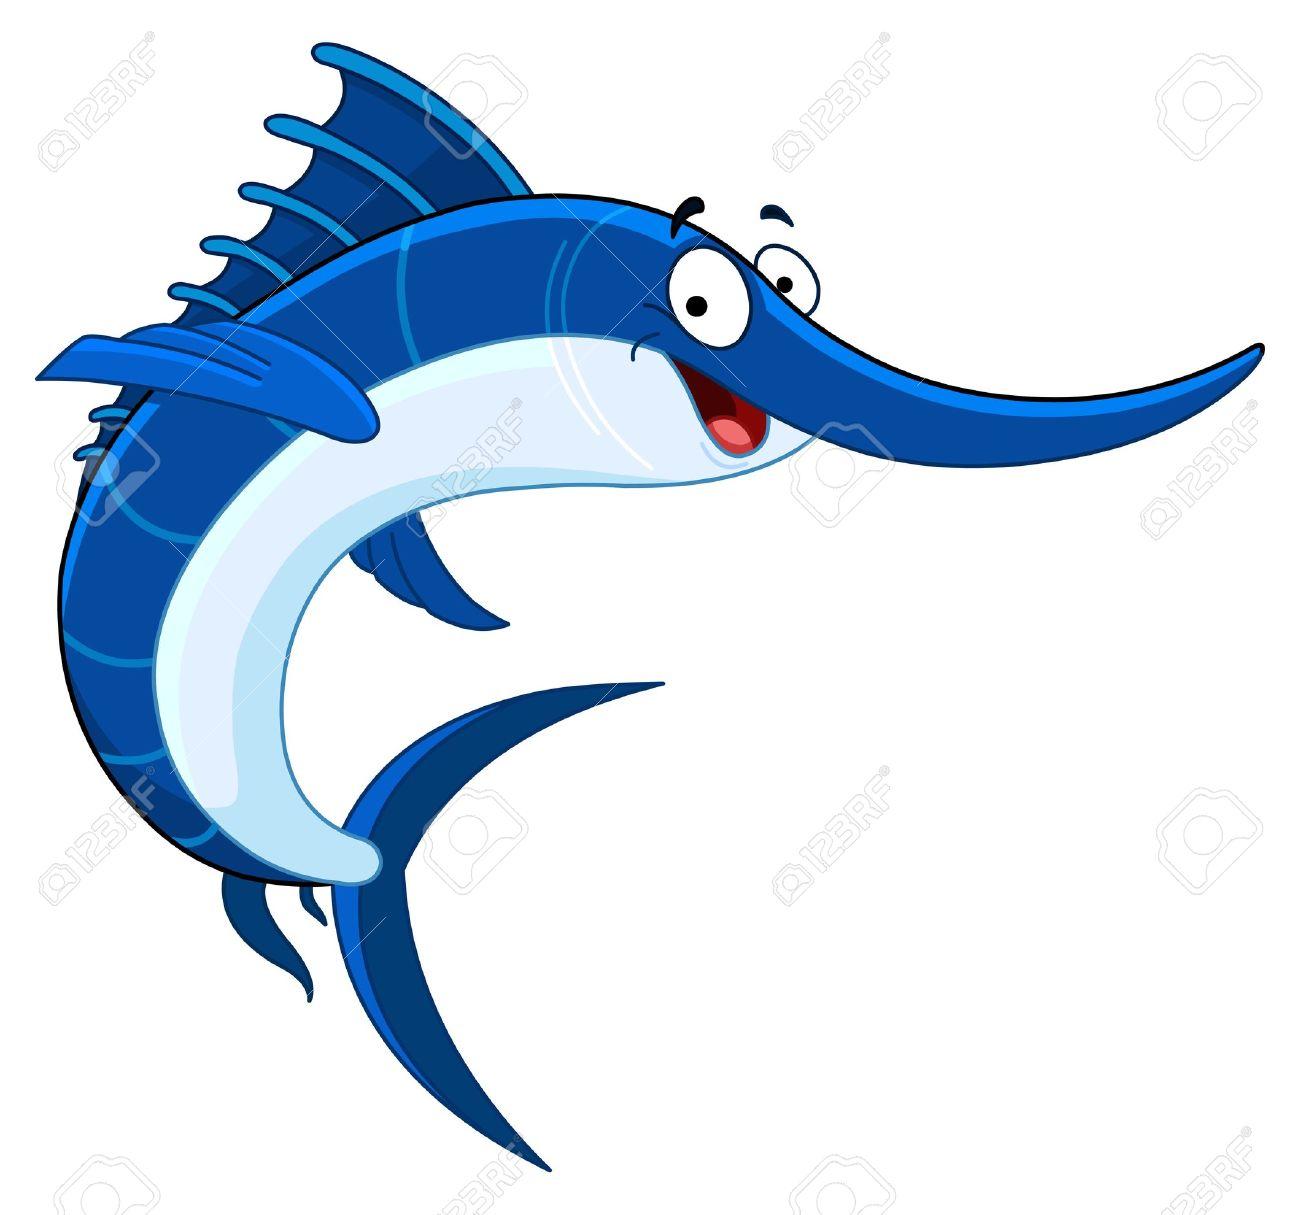 cartoon swordfish royalty free cliparts vectors and stock rh 123rf com swordfish clipart